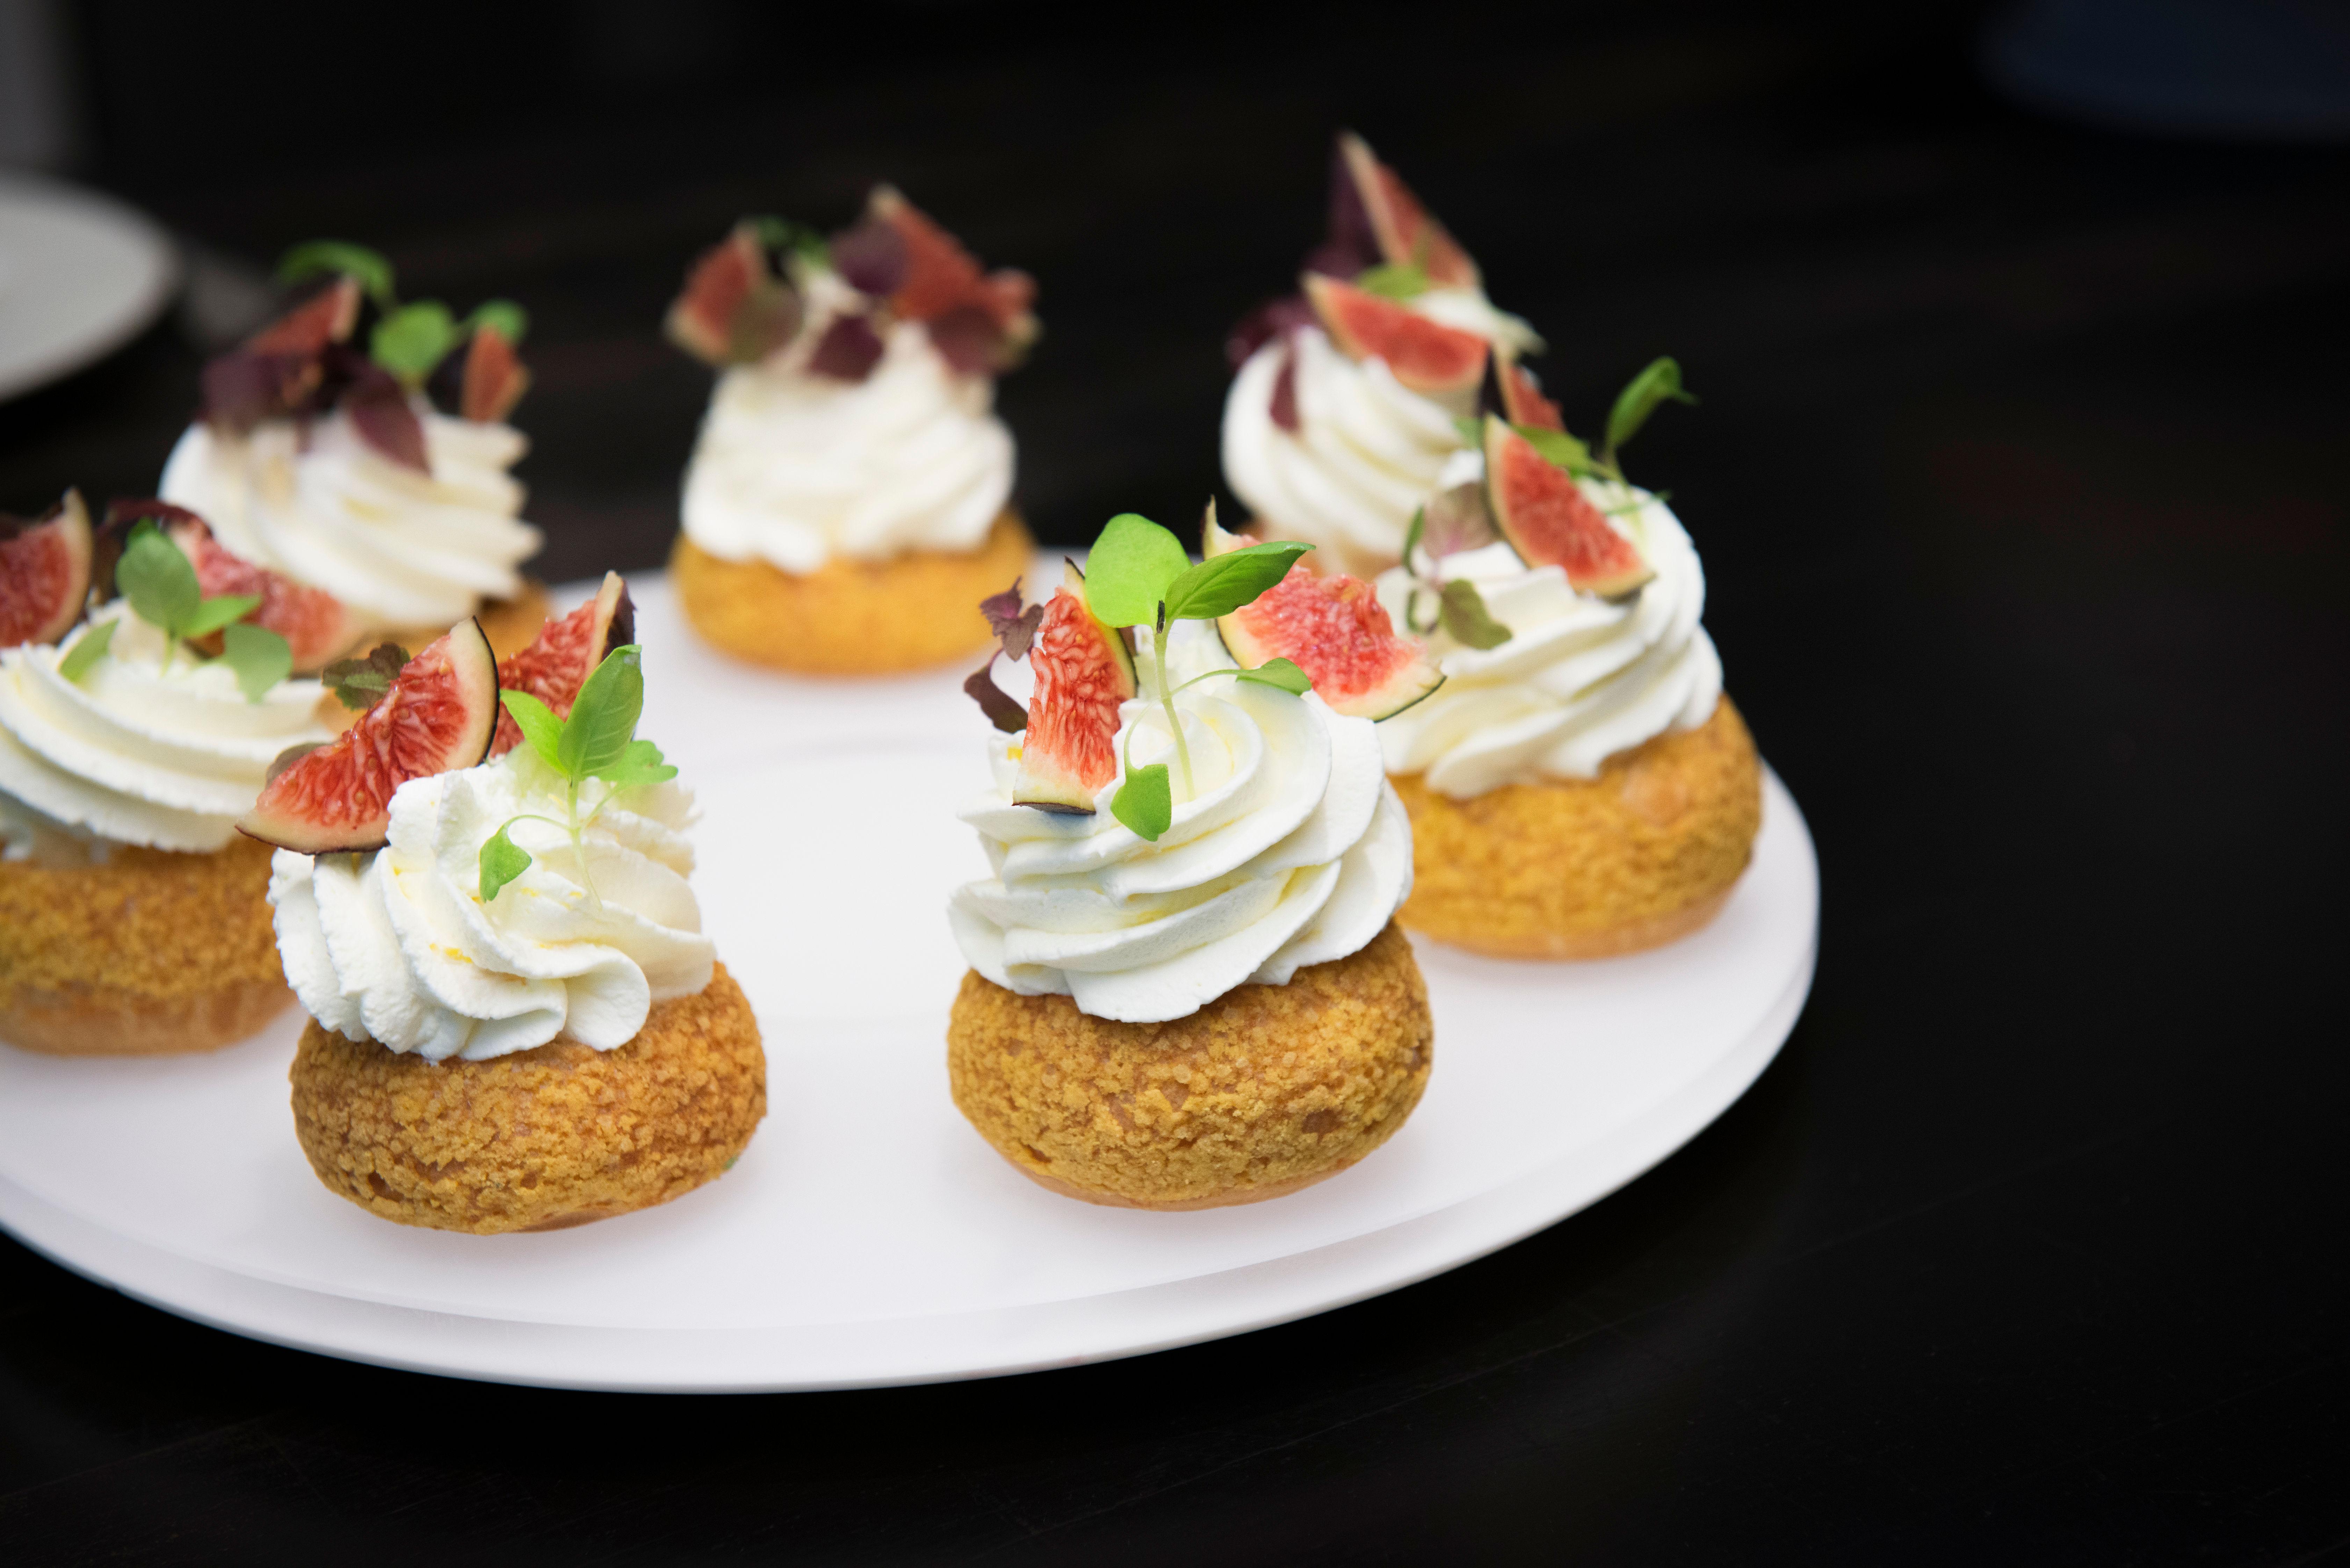 Ecole de cuisine alain ducasse choupastry class in ecole - Cours de cuisine brest ...